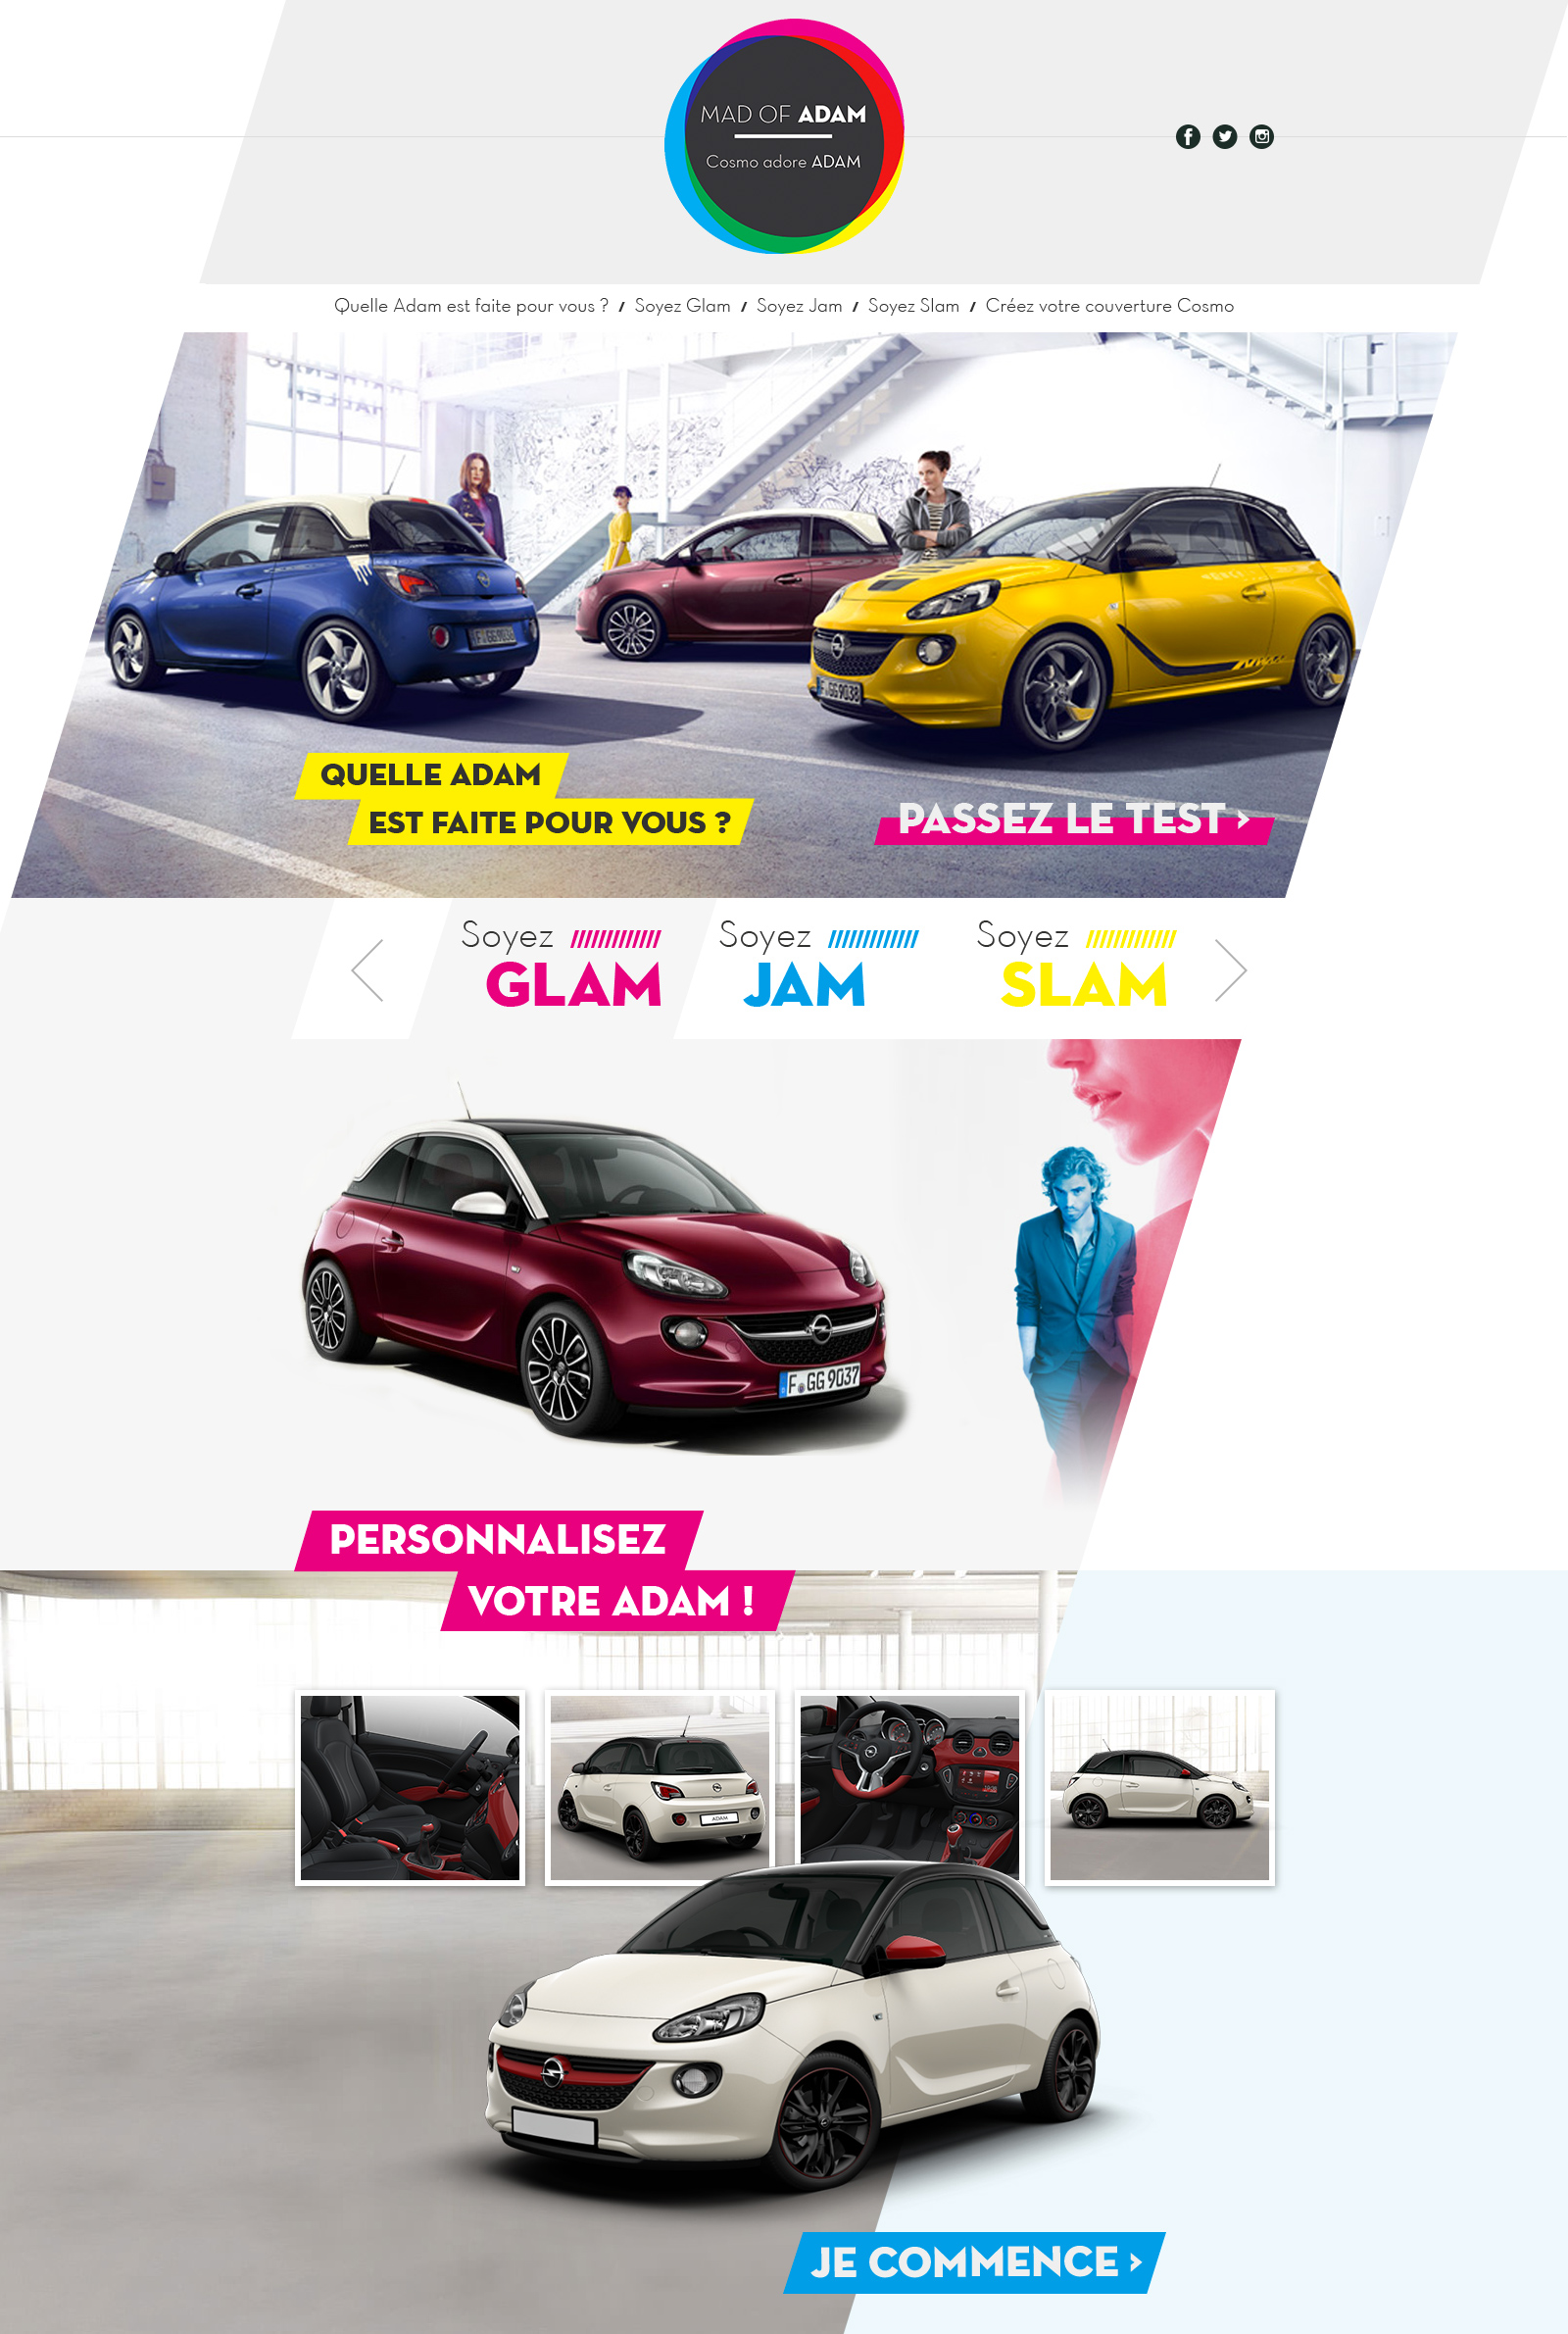 Opel - Mad of Adam